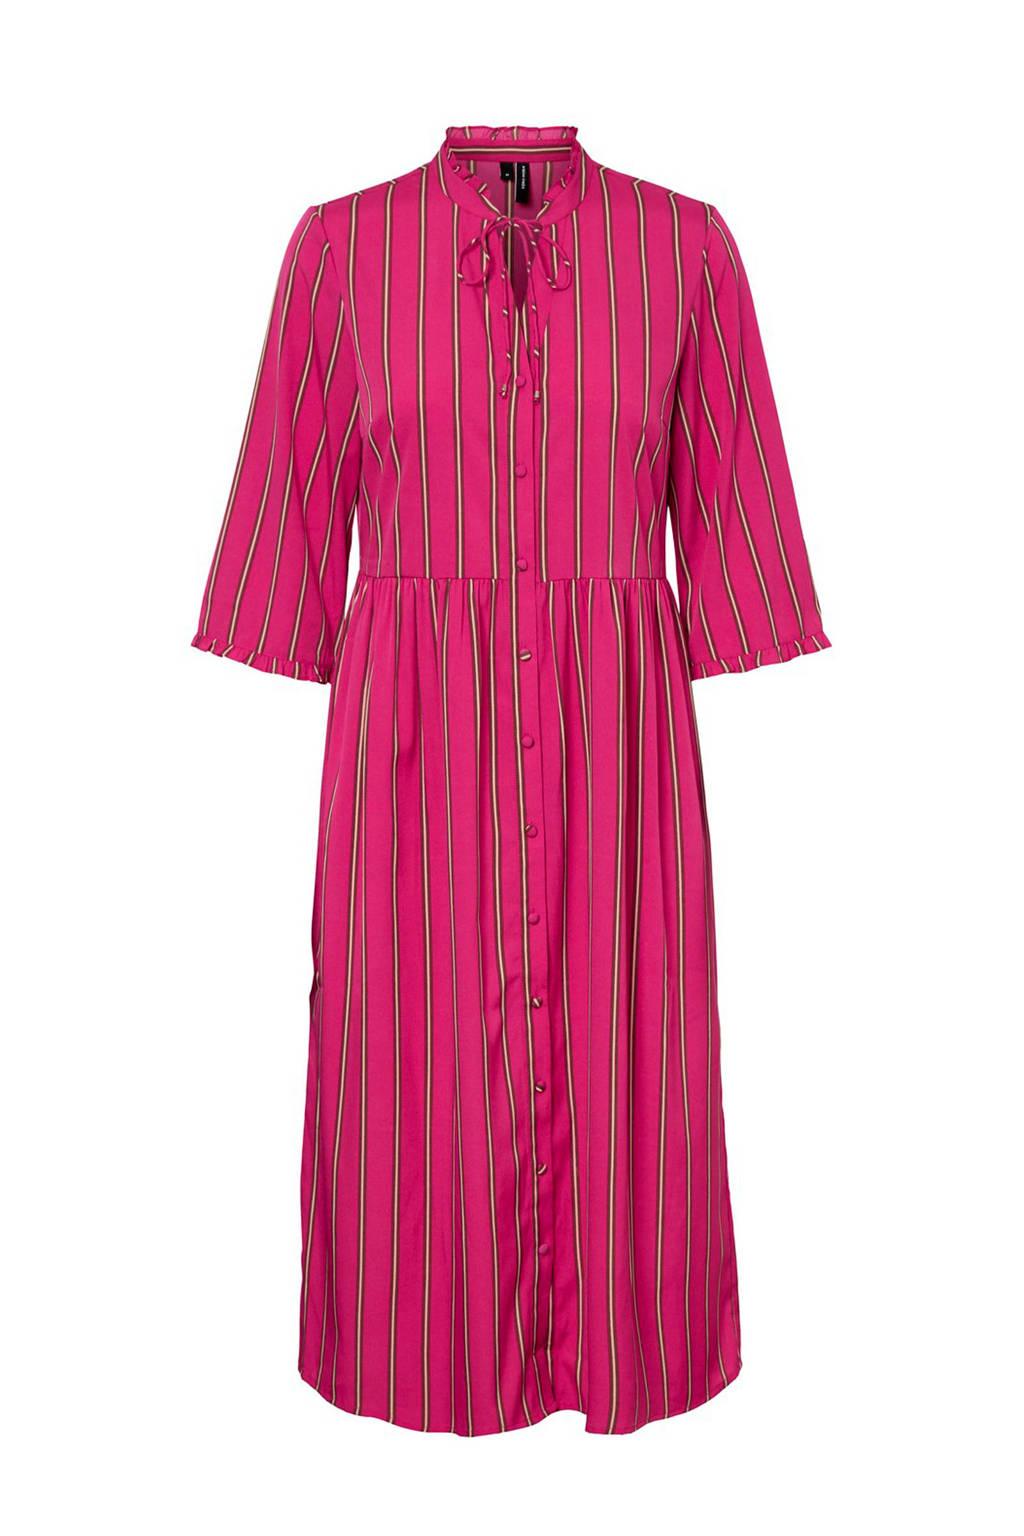 VERO MODA gestreepte blousejurk lang, Roze/wit